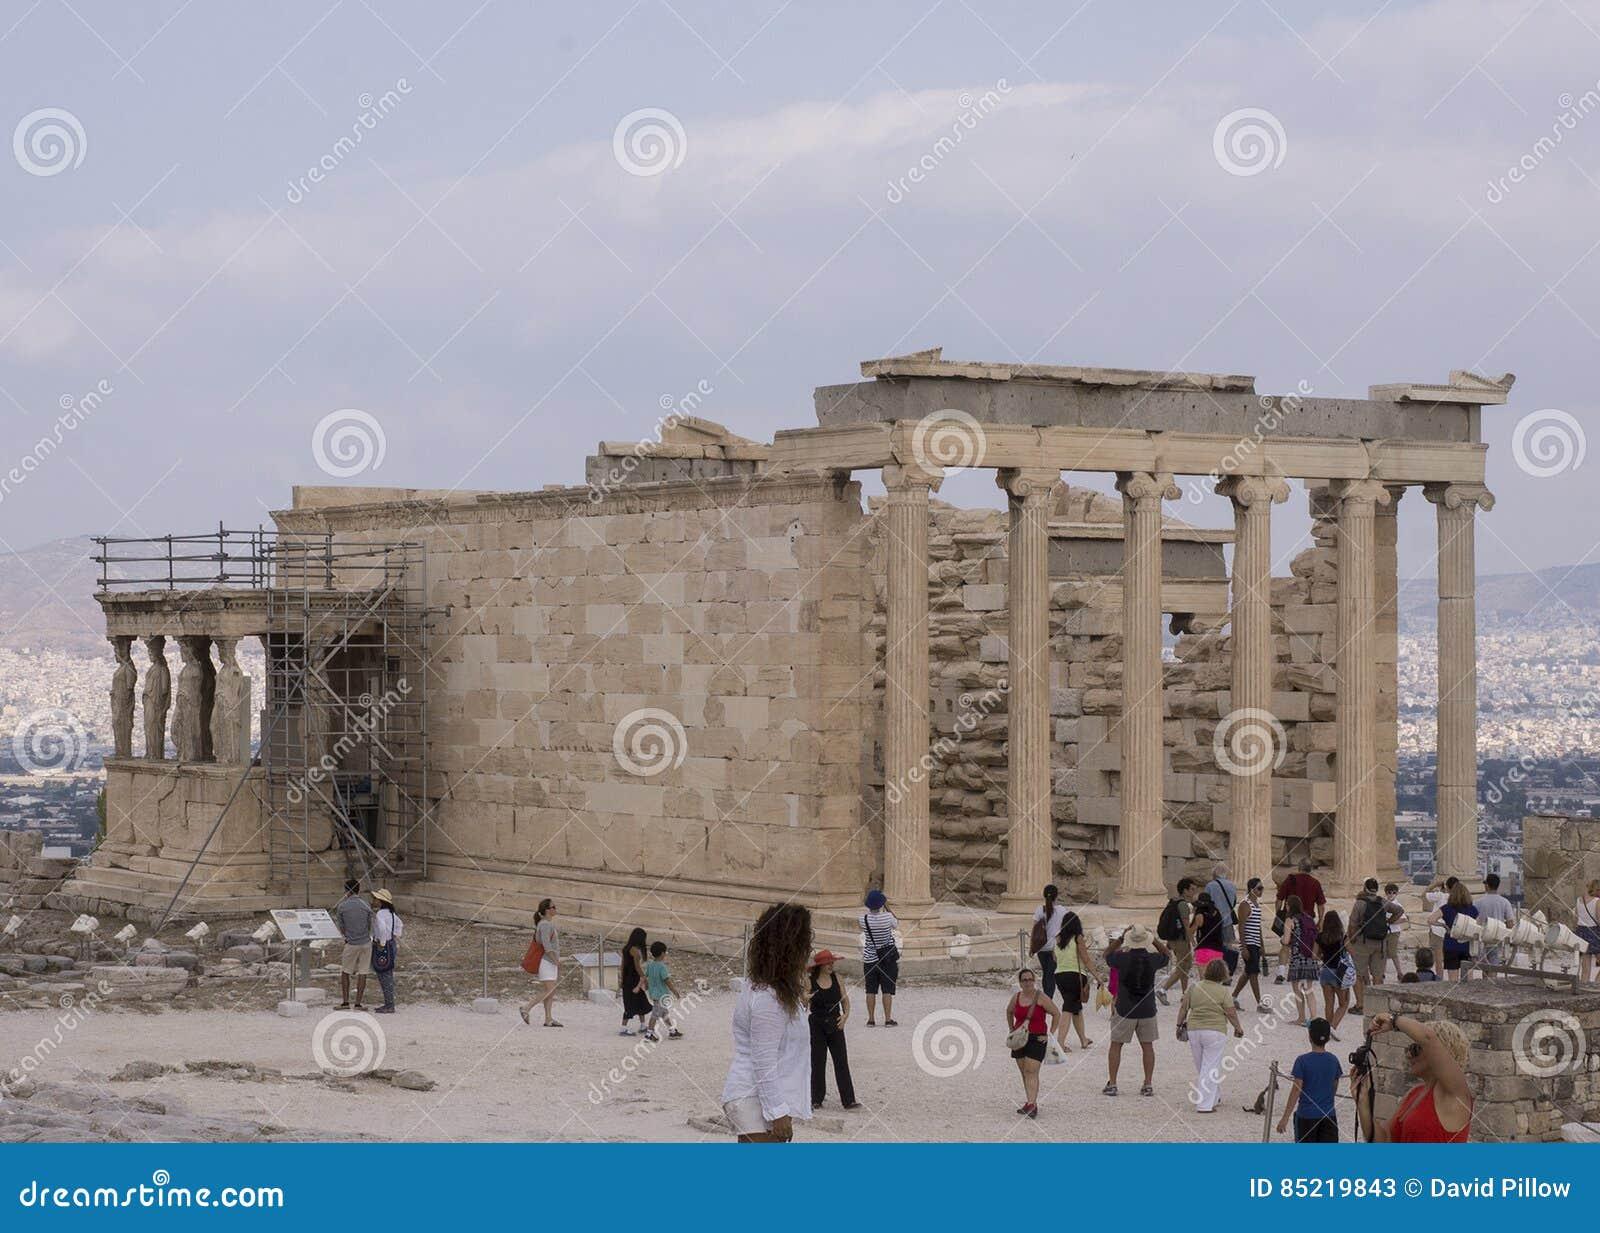 The Erechtheum, a Greek Temple